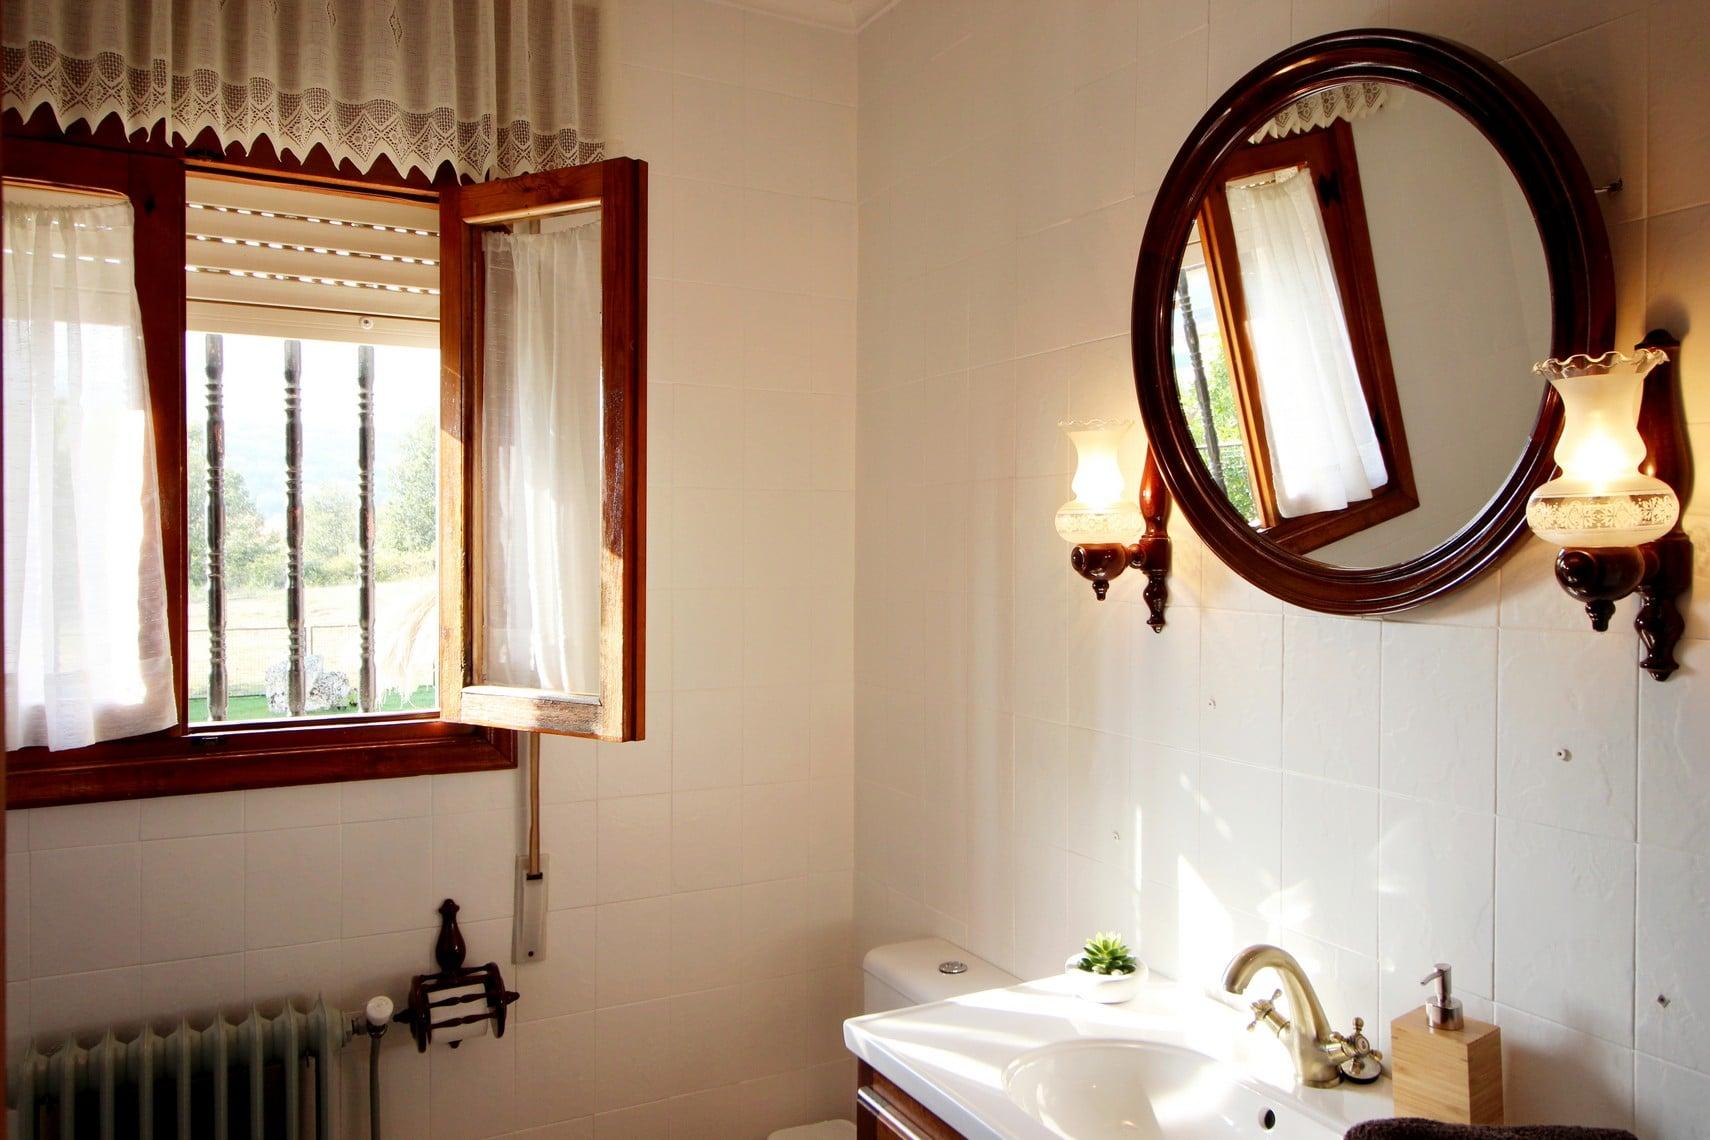 baño1_las_hazas_jarandilla0005